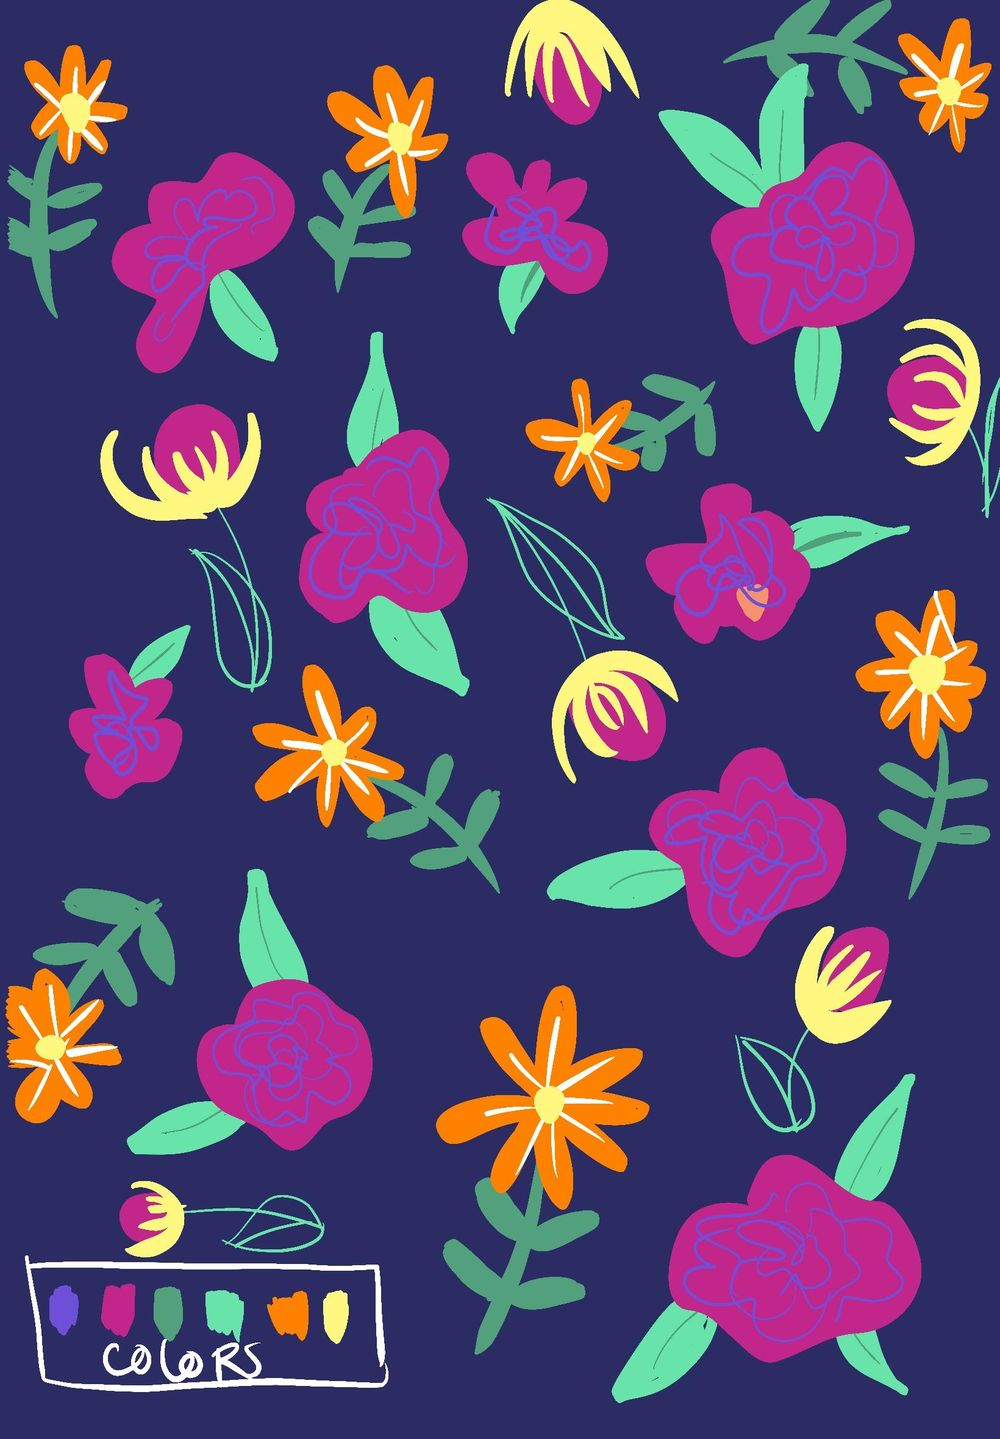 My folk flowers (work in progress) - image 4 - student project